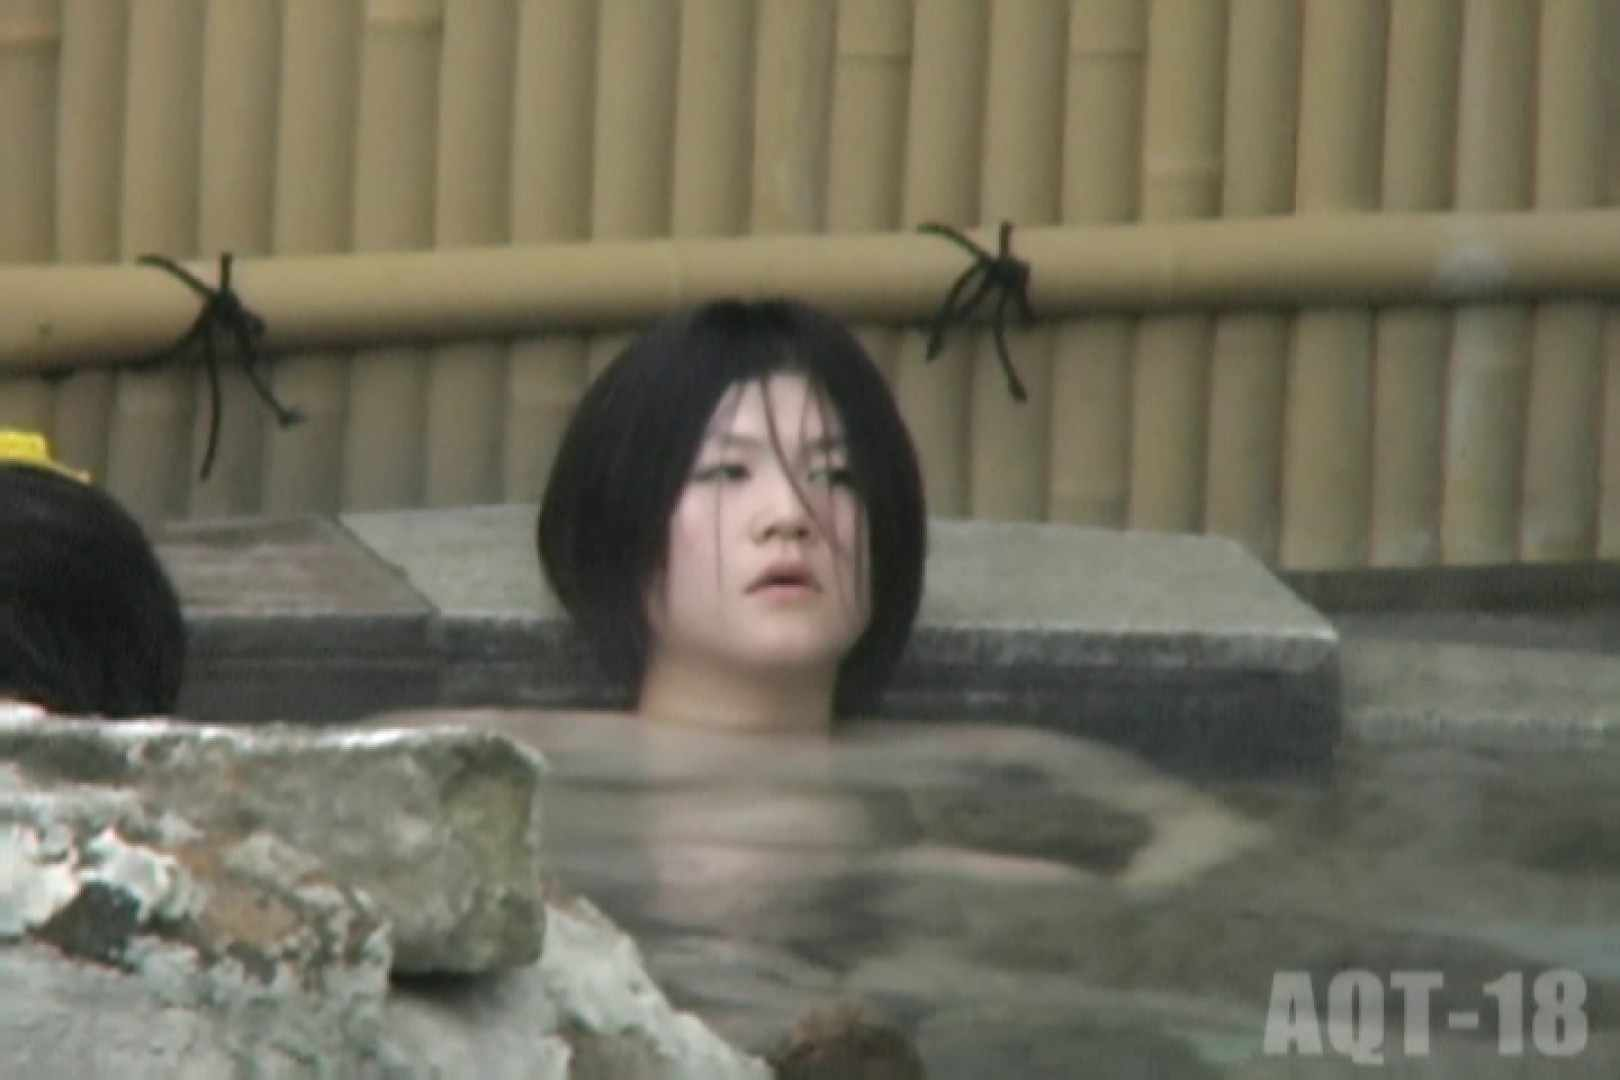 Aquaな露天風呂Vol.859 露天風呂編 | 盗撮シリーズ  76PIX 19